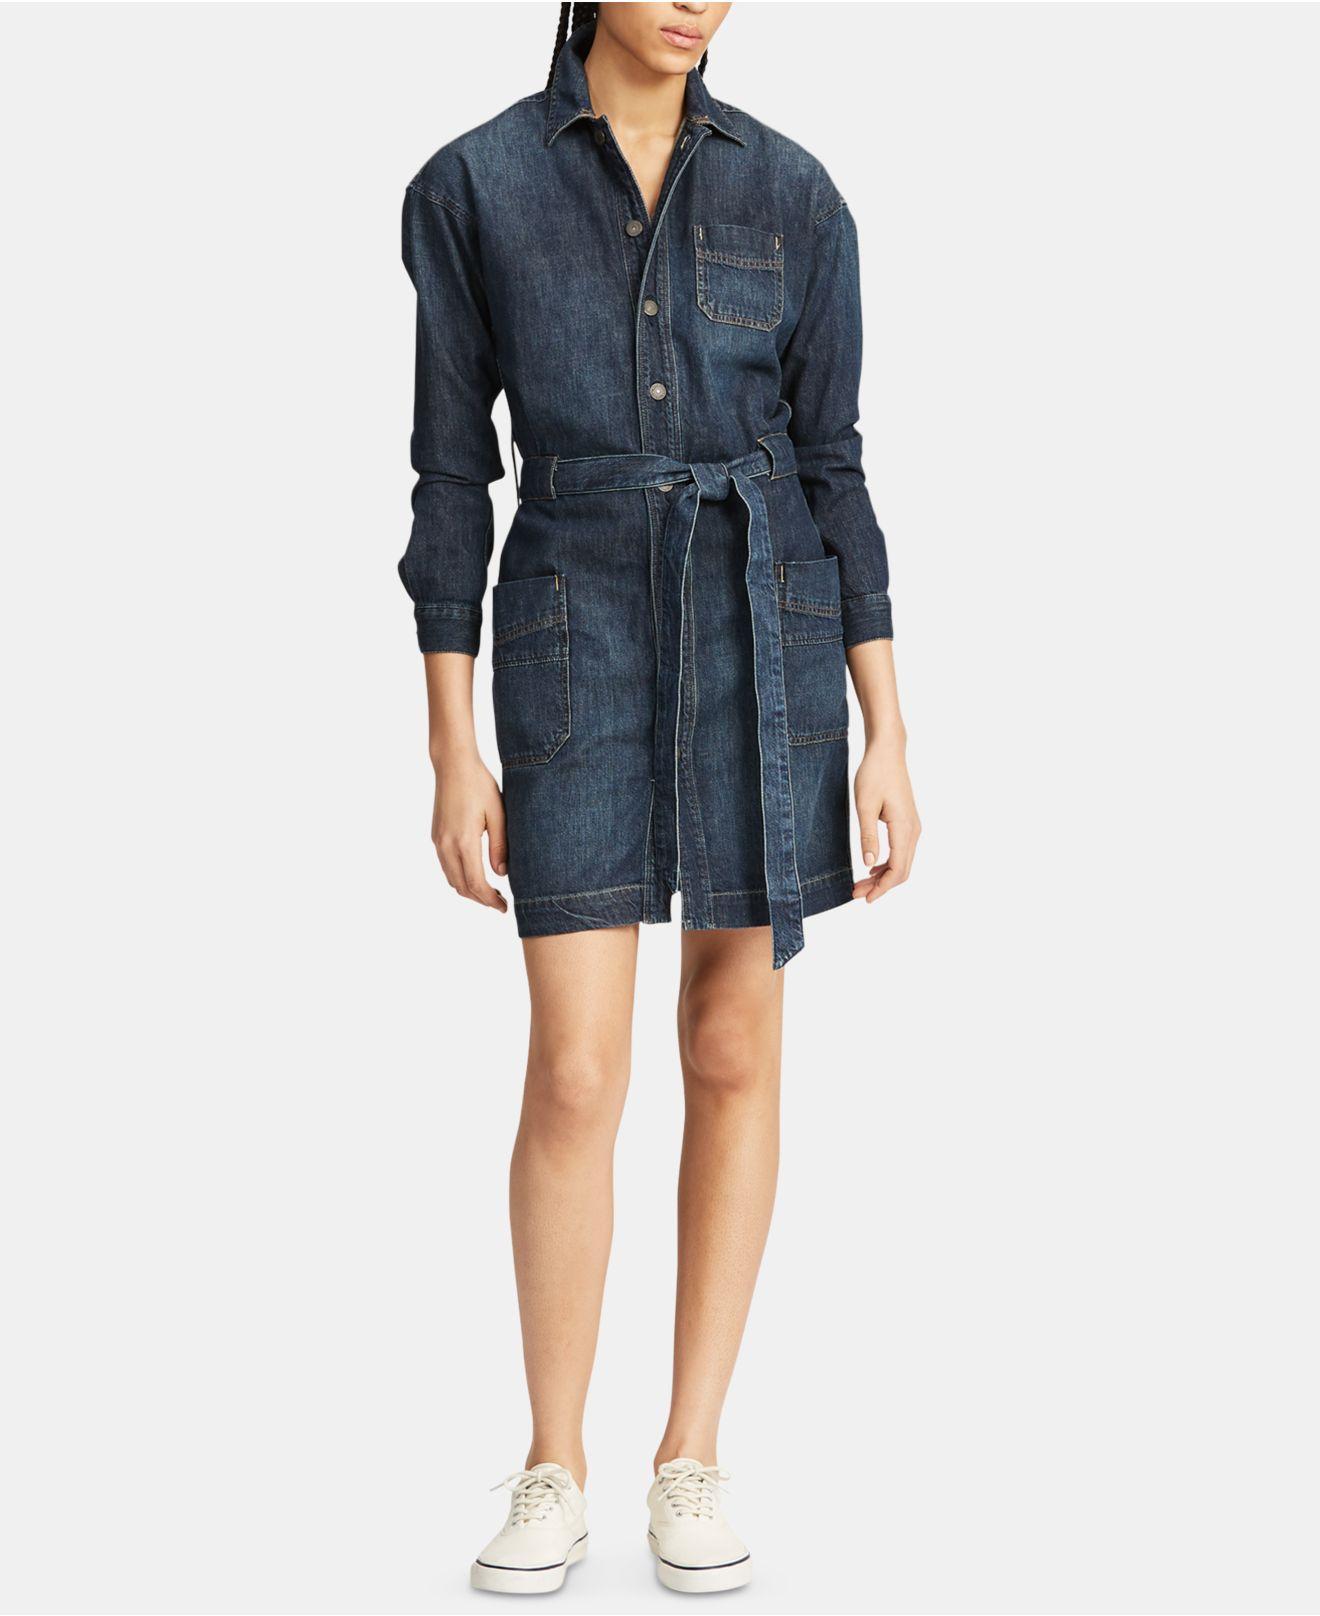 7f1bb7869c6 Lyst - Polo Ralph Lauren Denim Cotton Shirtdress in Blue - Save 14%